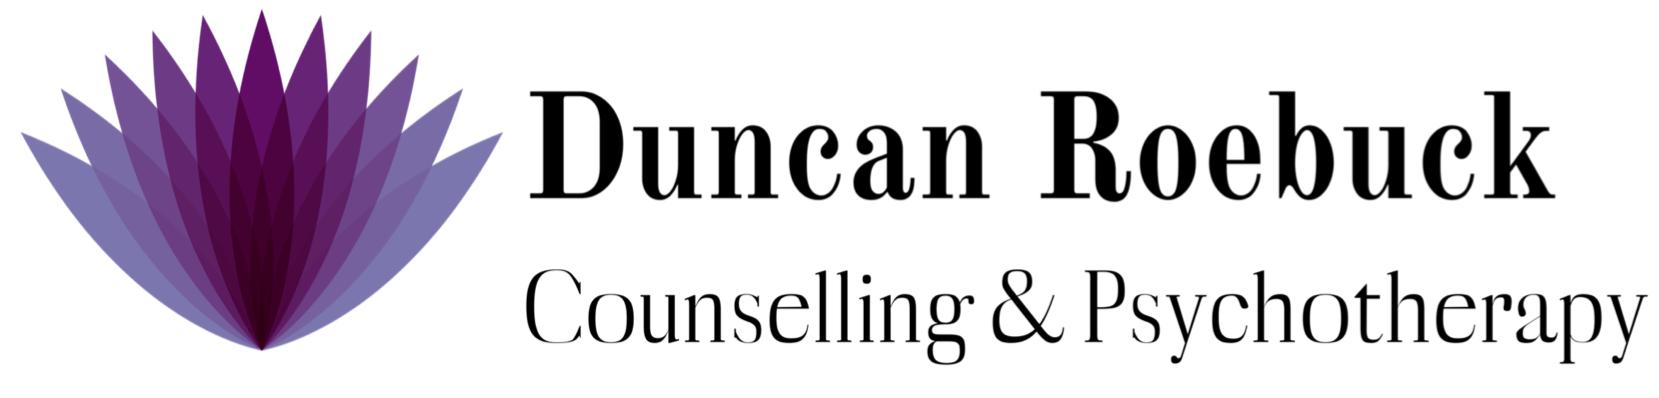 Duncan Roebuck